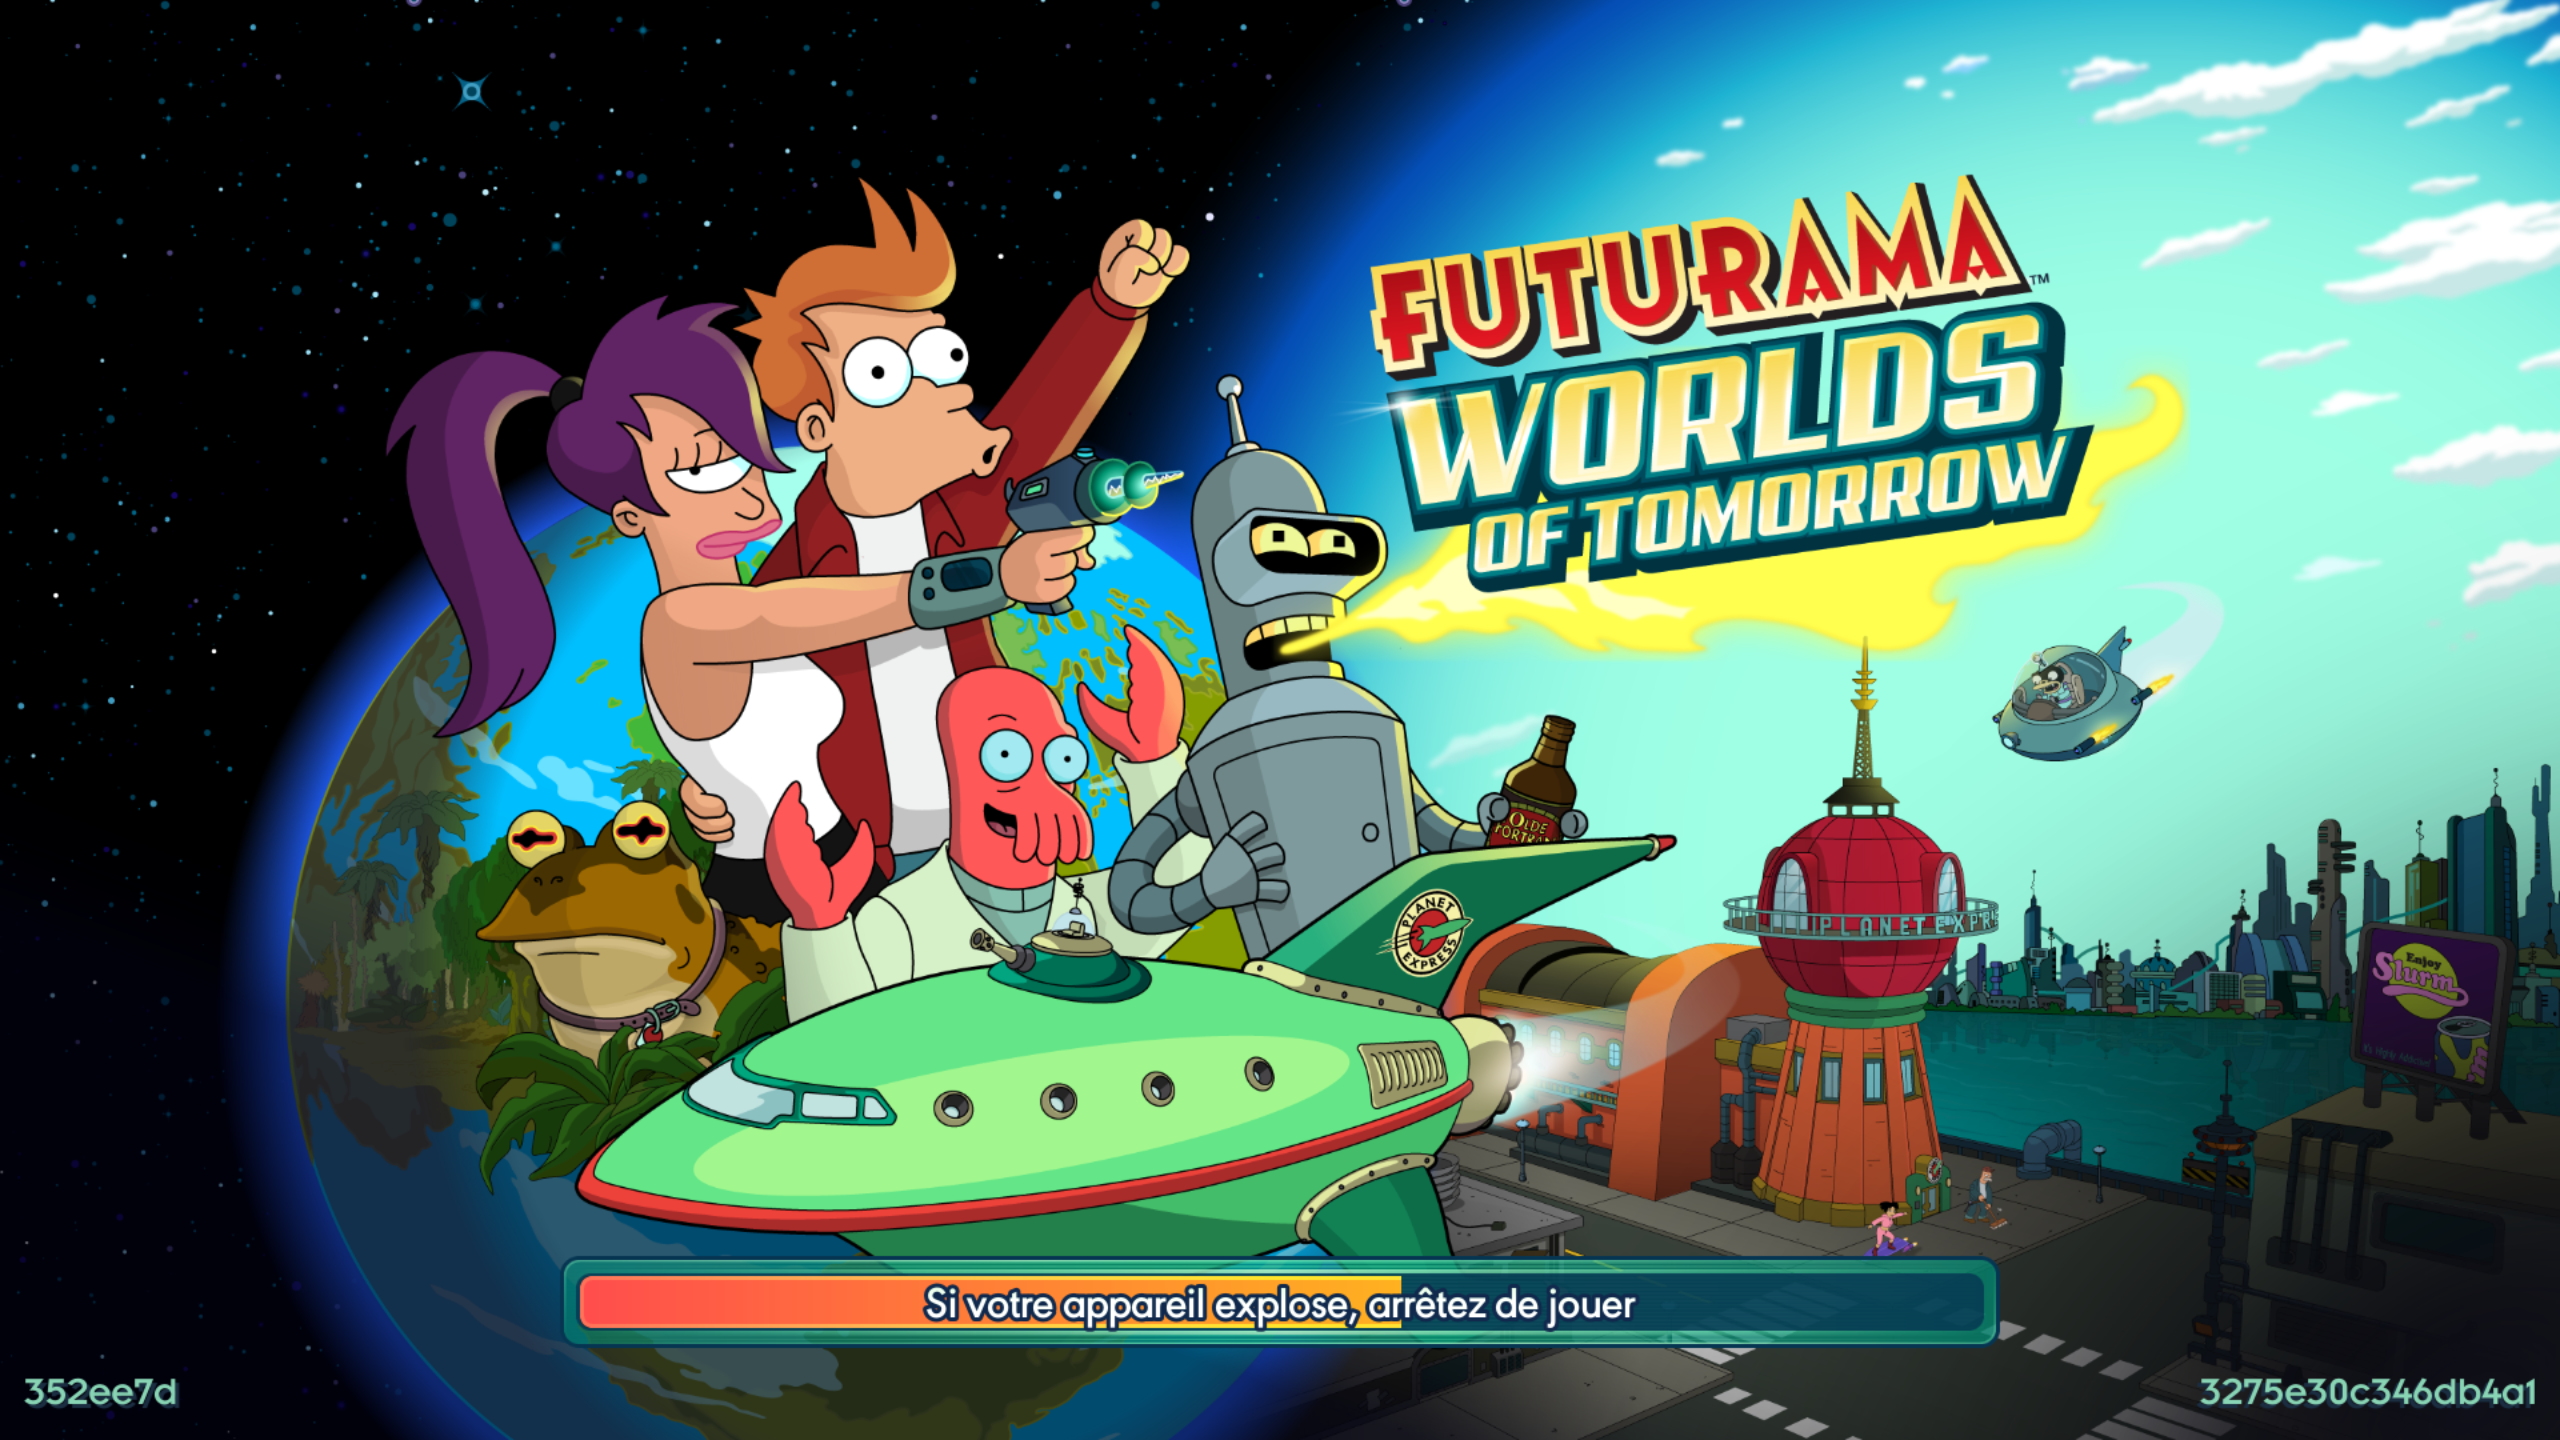 futurama-worlds-of-tomorrow-1